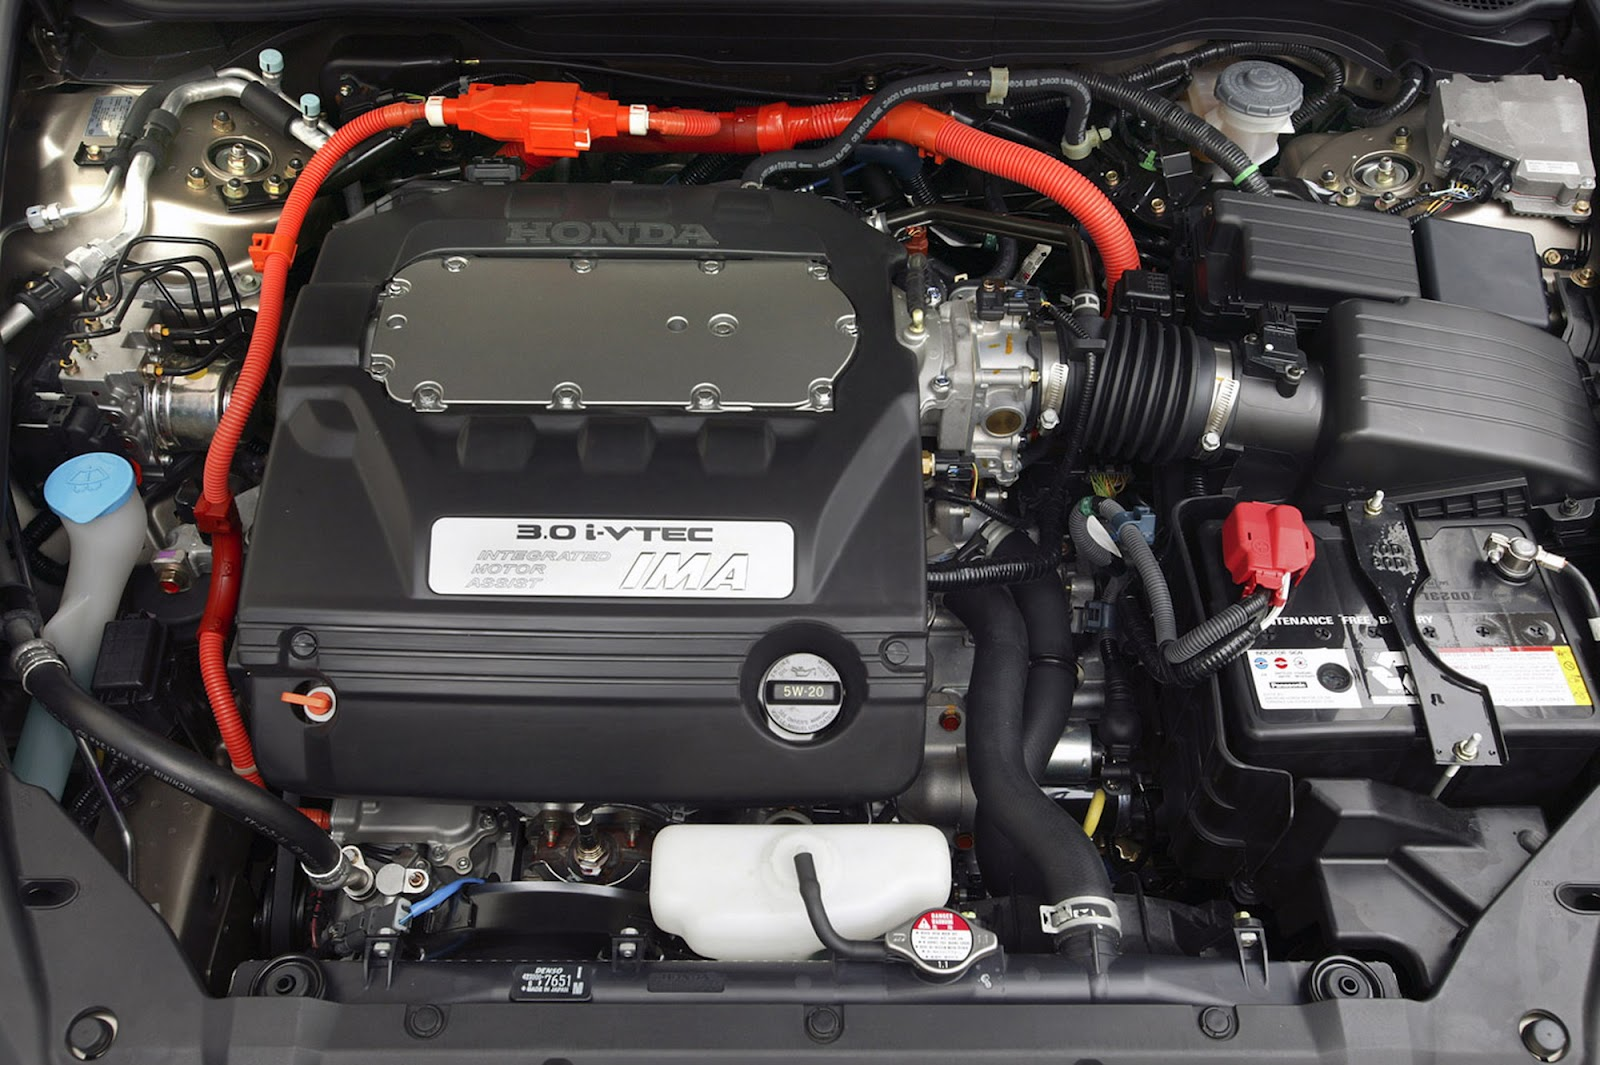 2003 honda civic hybrid fuse box diagram citroen c5 wiring accord fuel pump relay location free engine